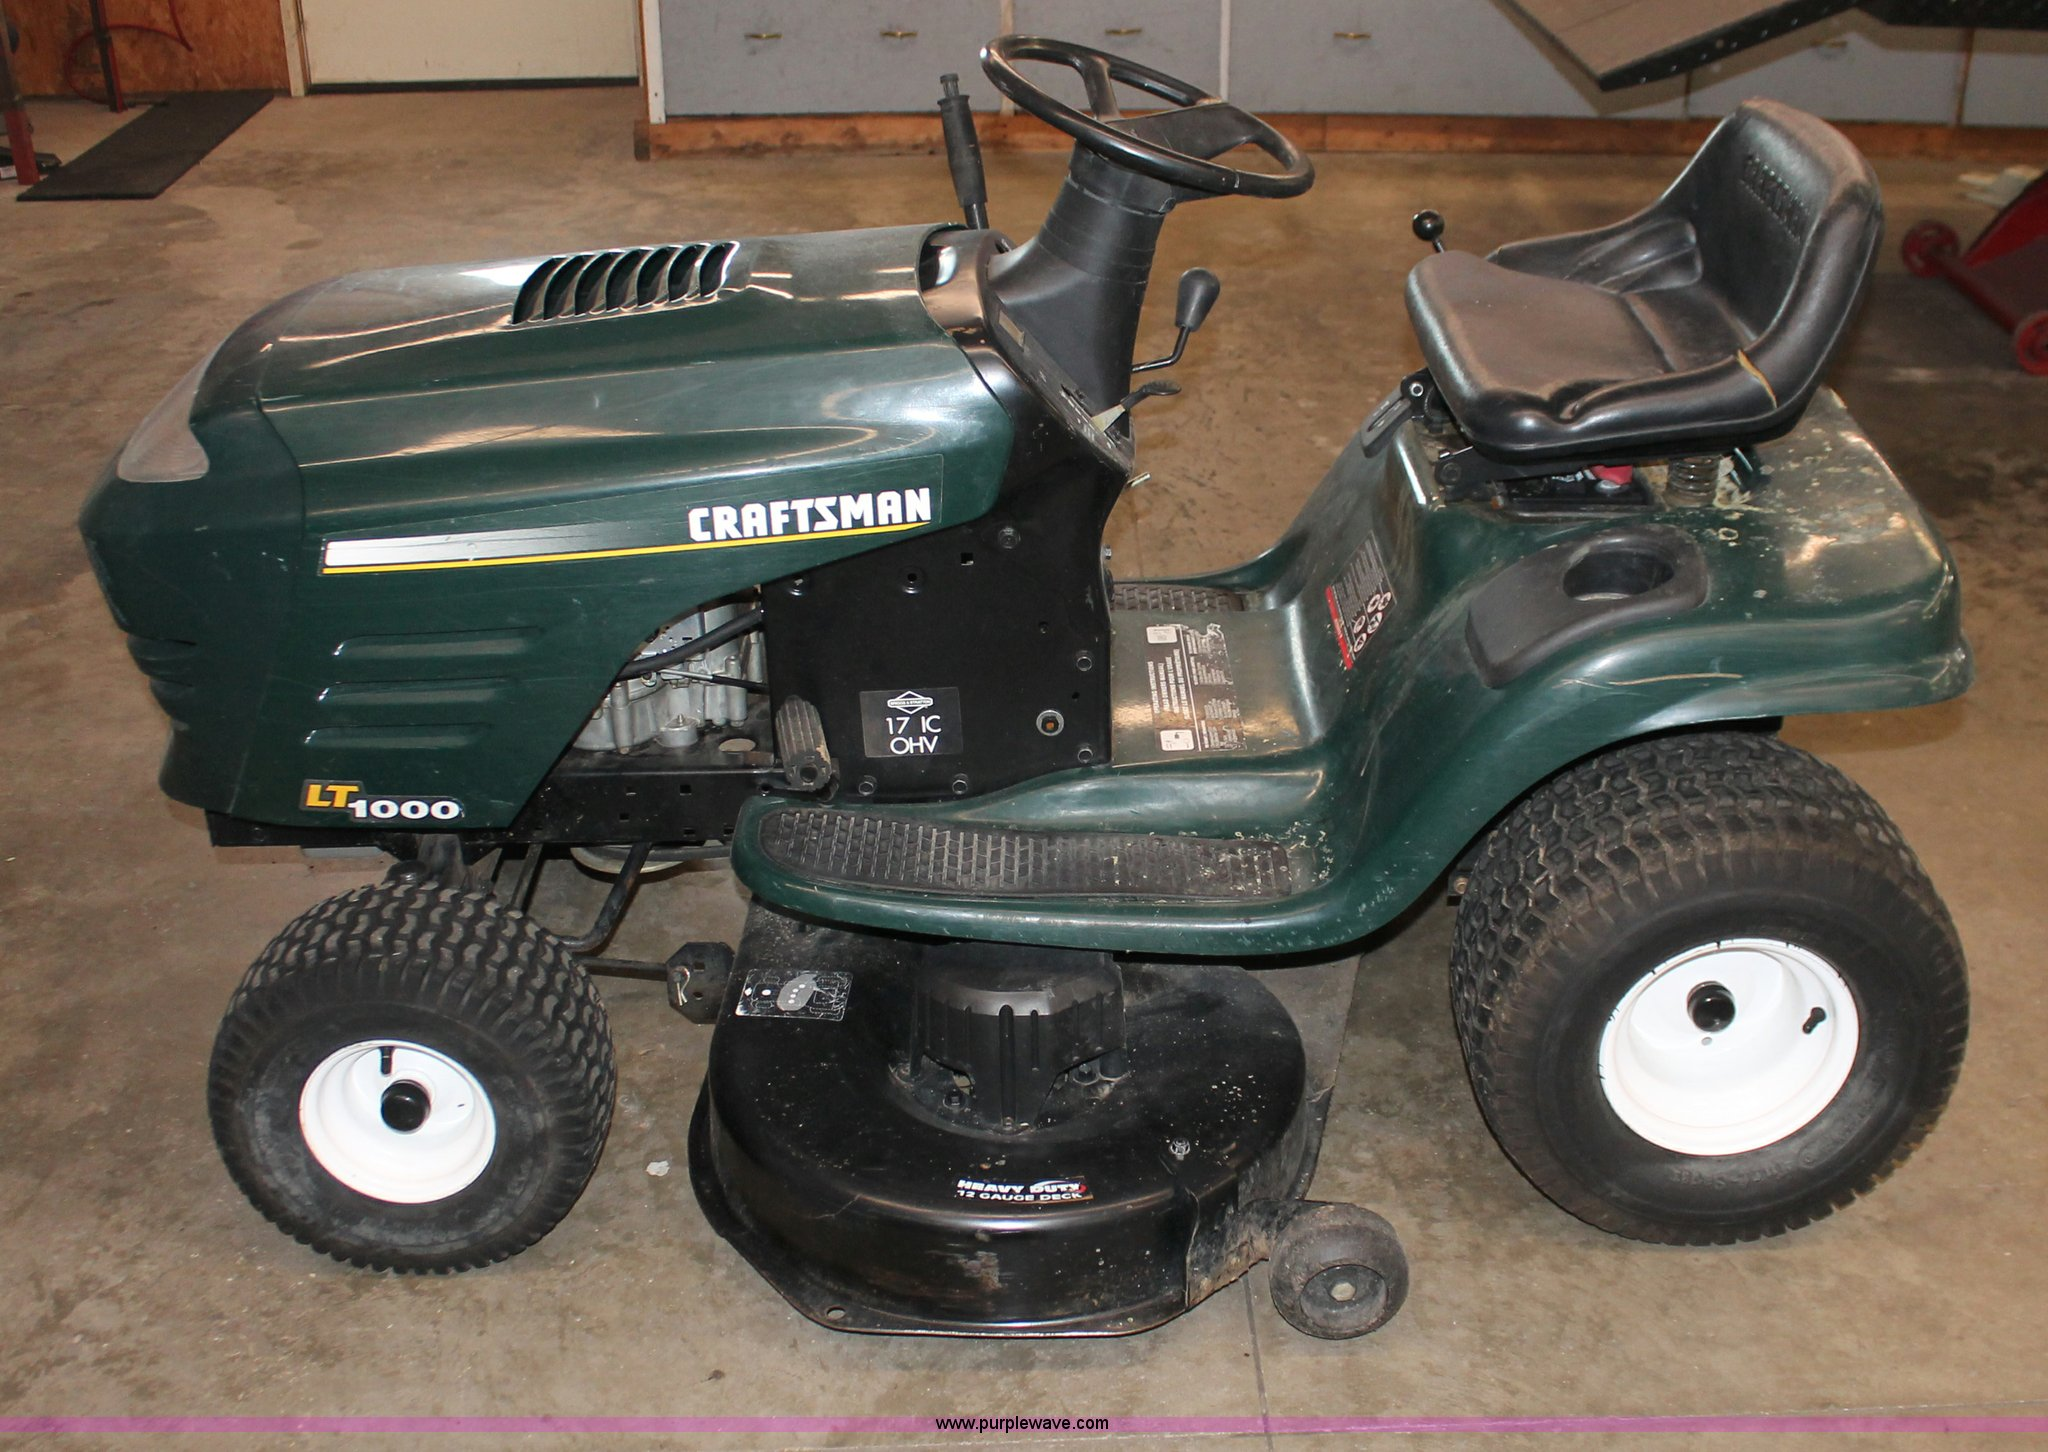 Craftsman LT1000 lawn mower | Item V9239 | SOLD! February 20